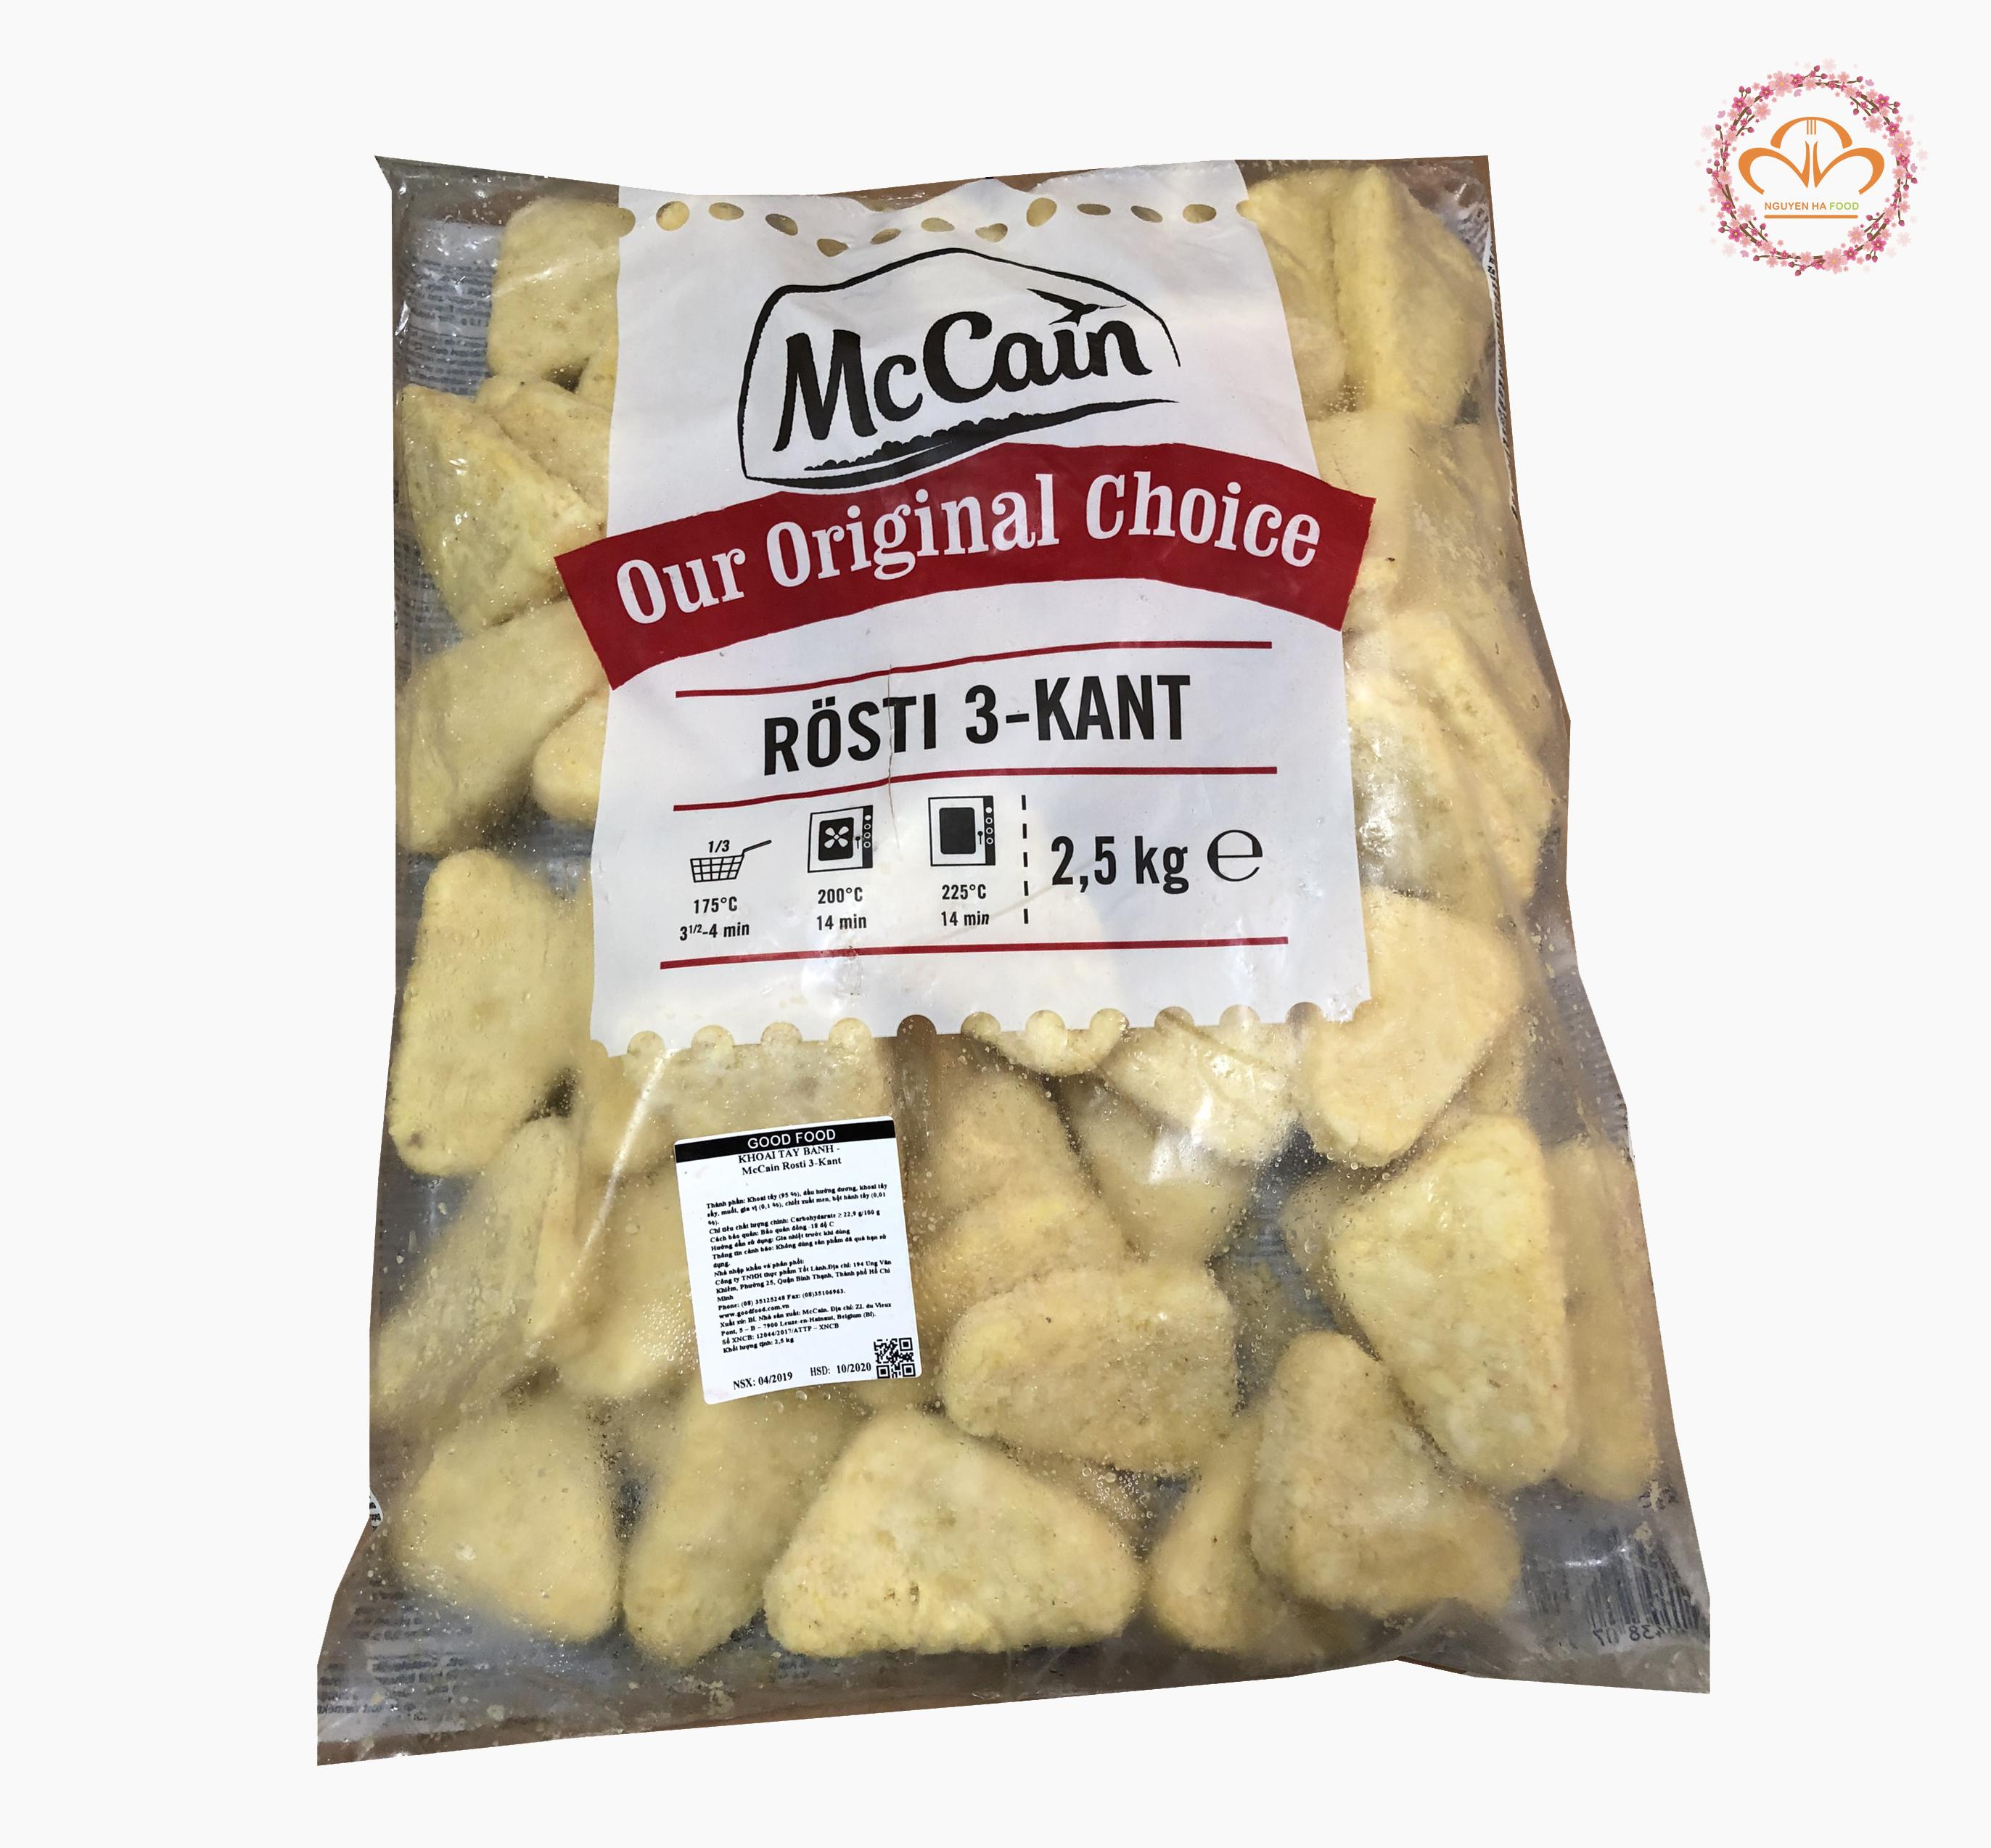 khoai tây mccain hash brown tam giác (mccain rosti 3 kant)